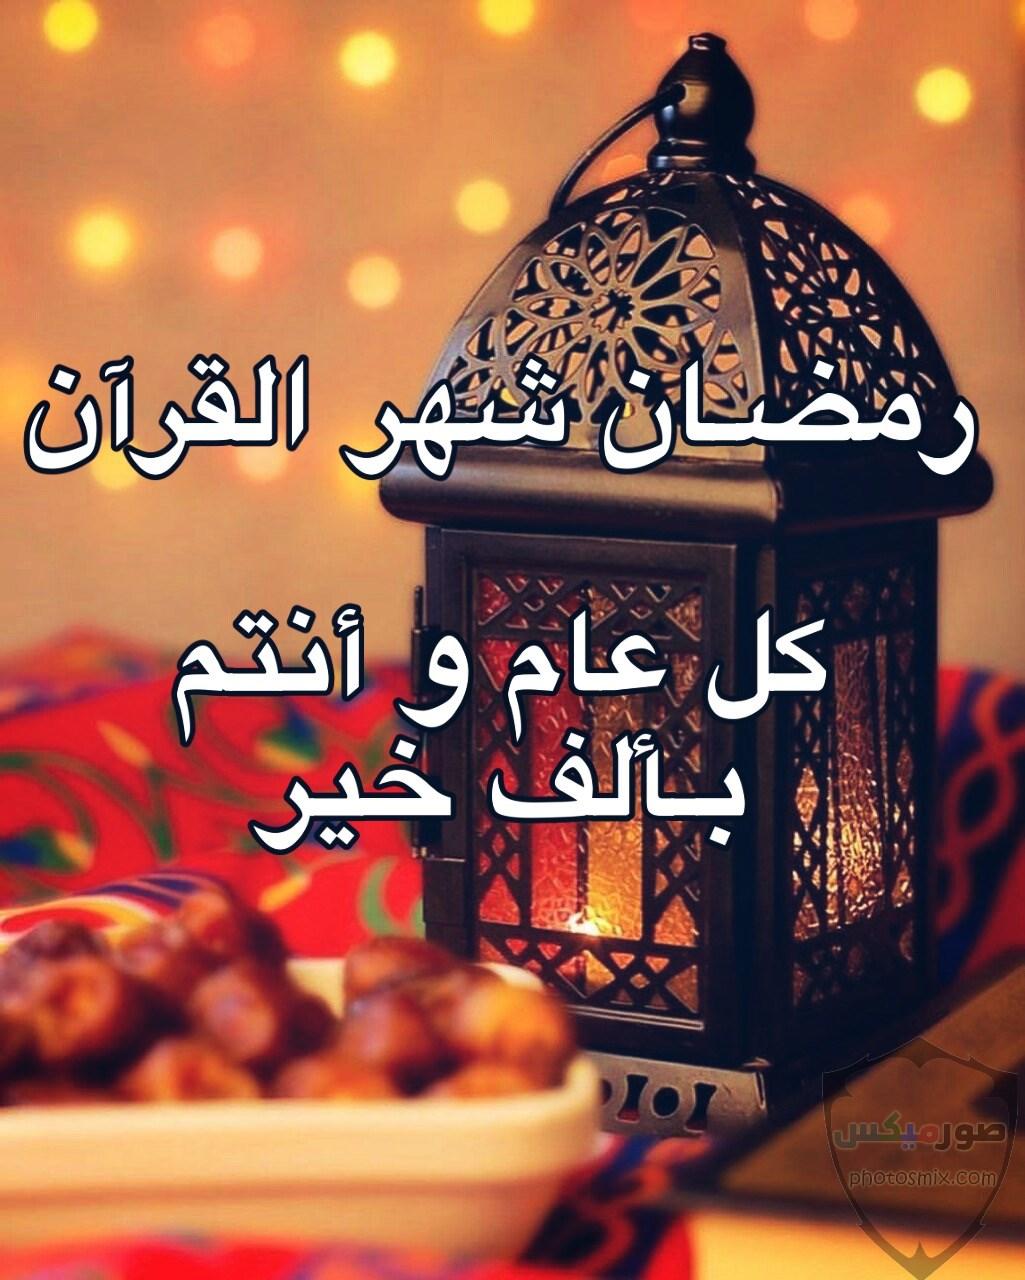 صور تهنئة بمناسبة رمضان 2020 4